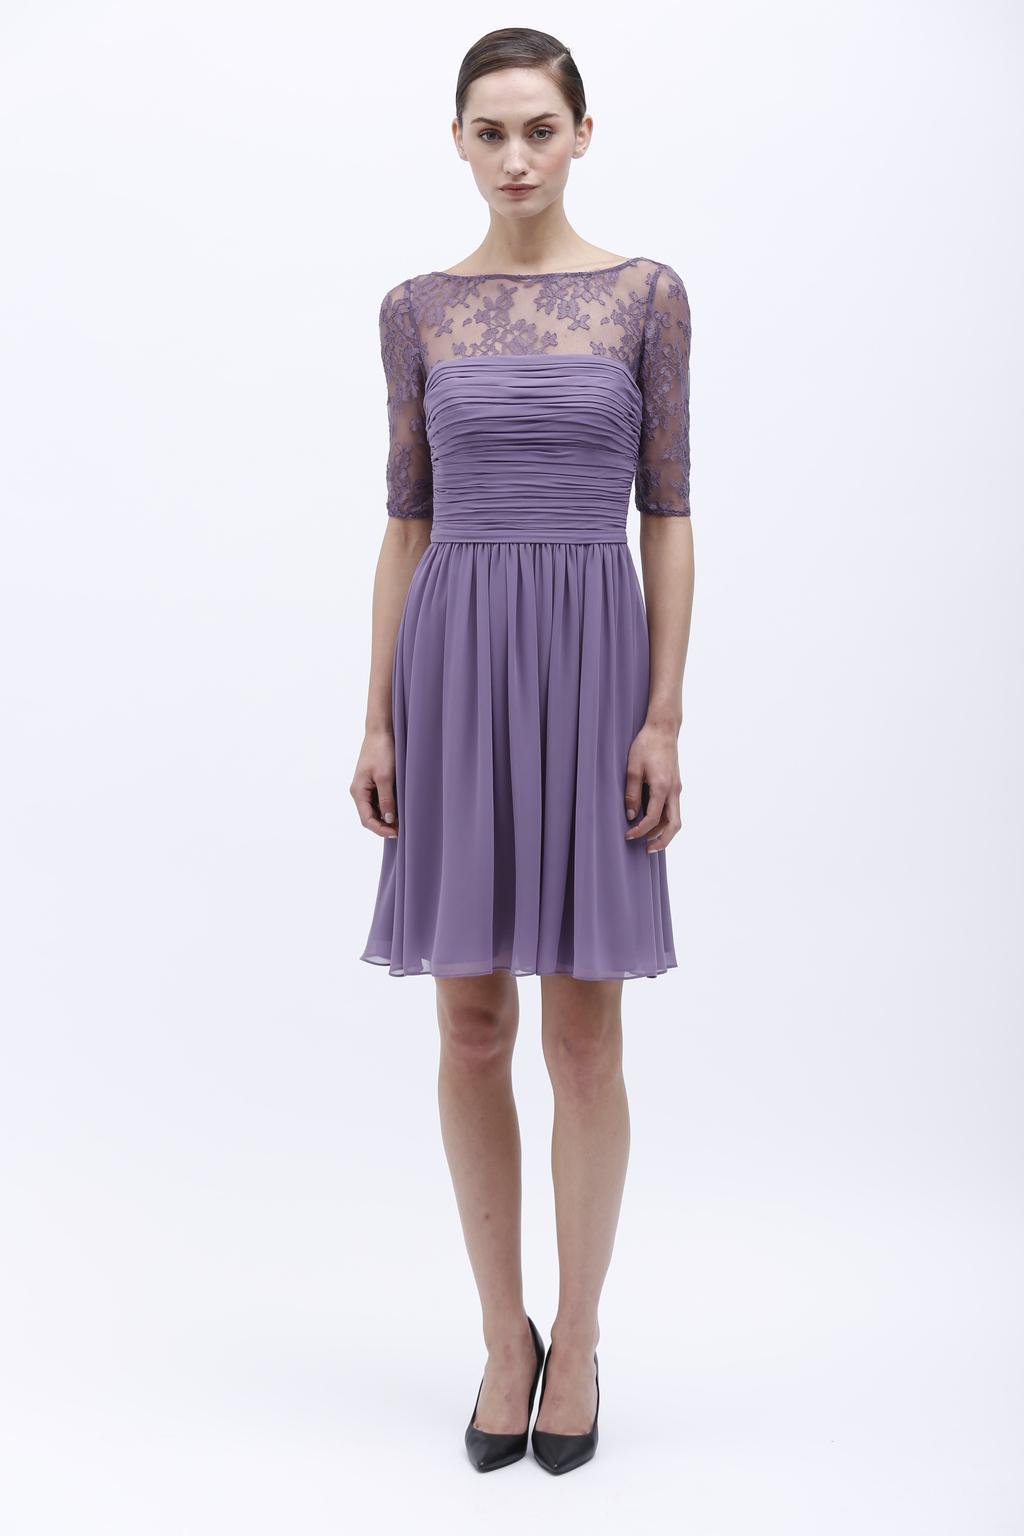 Monique-lhuillier-spring-2014-bridesmaid-dress-450155_violet.full